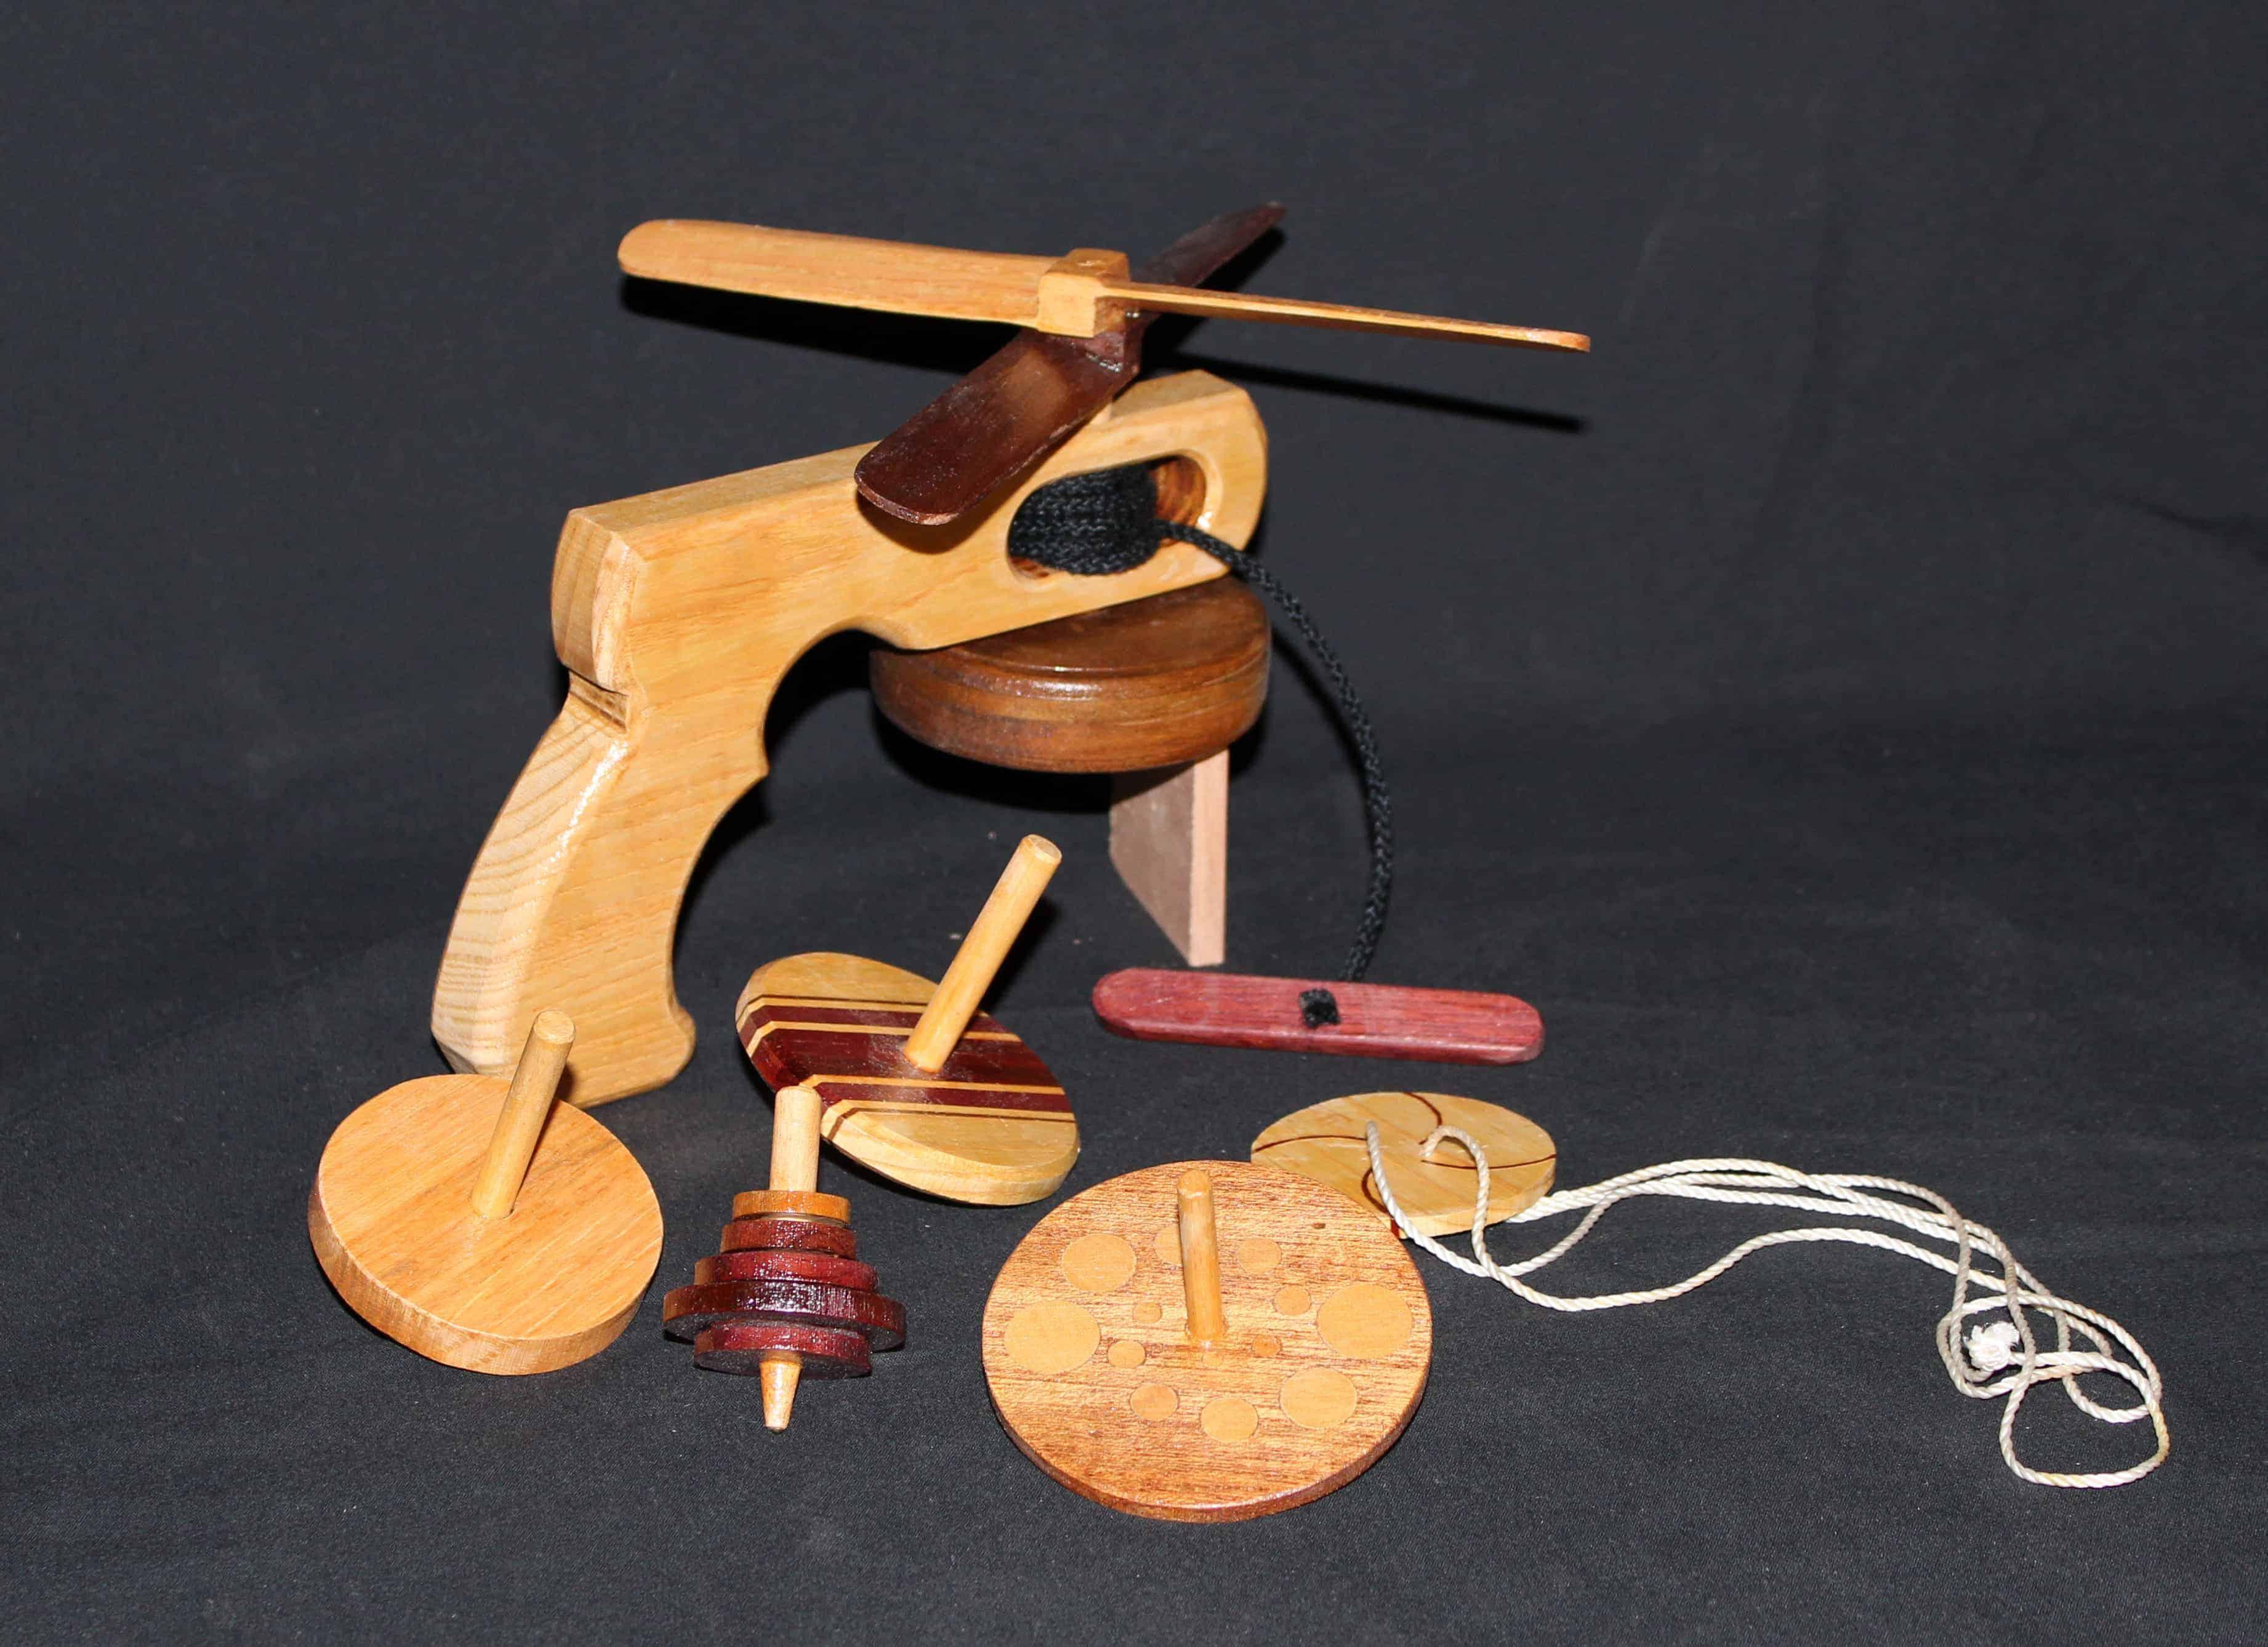 Woodworking plans of fun, easy to make wood novelites. A bonus of Christmas ornaments.